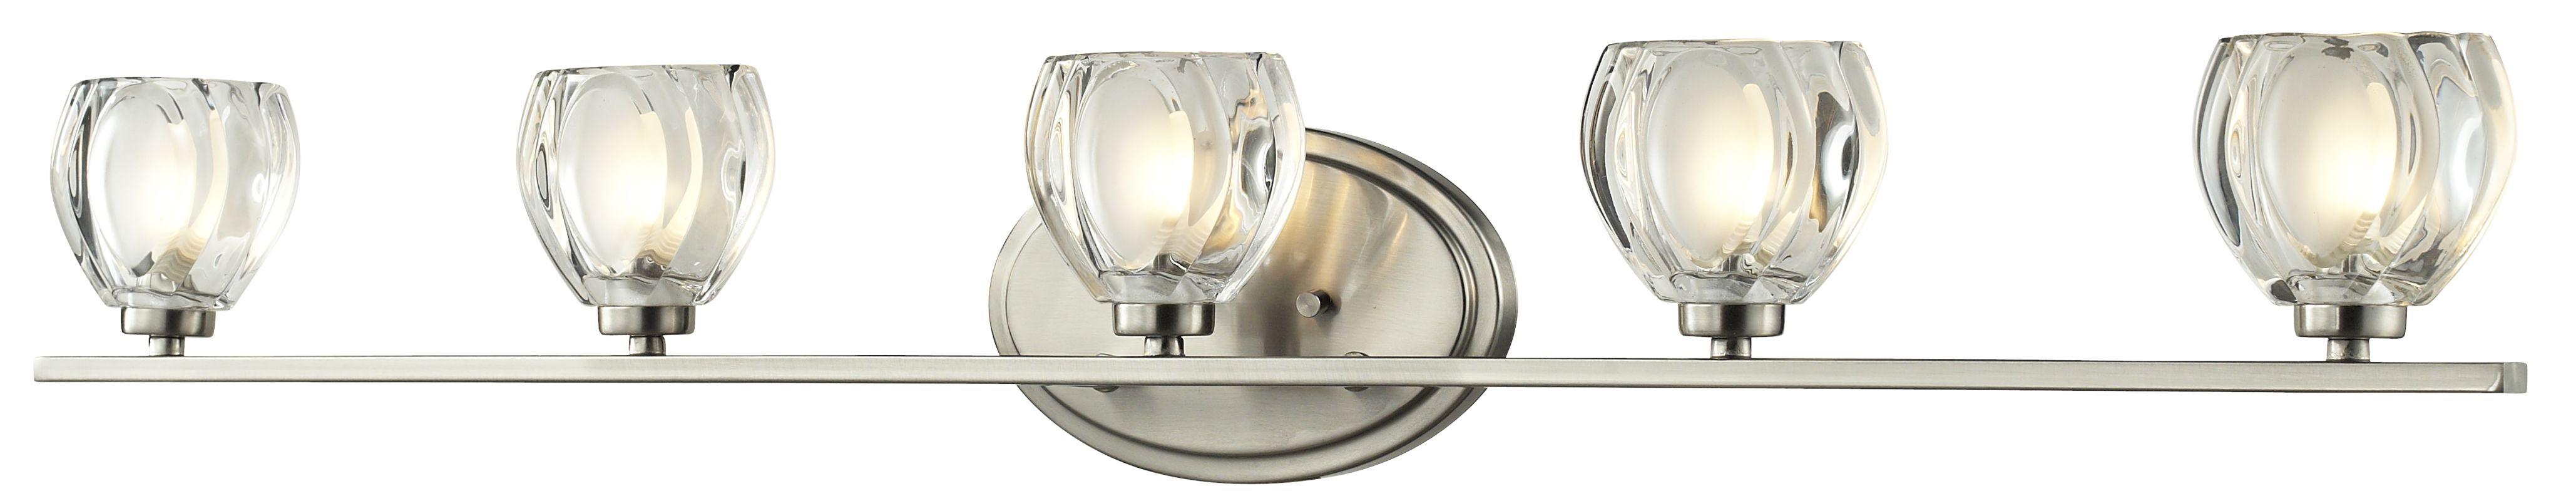 Z-Lite 3022-5V Hale 5 Light ADA Compliant Bathroom Vanity Light with